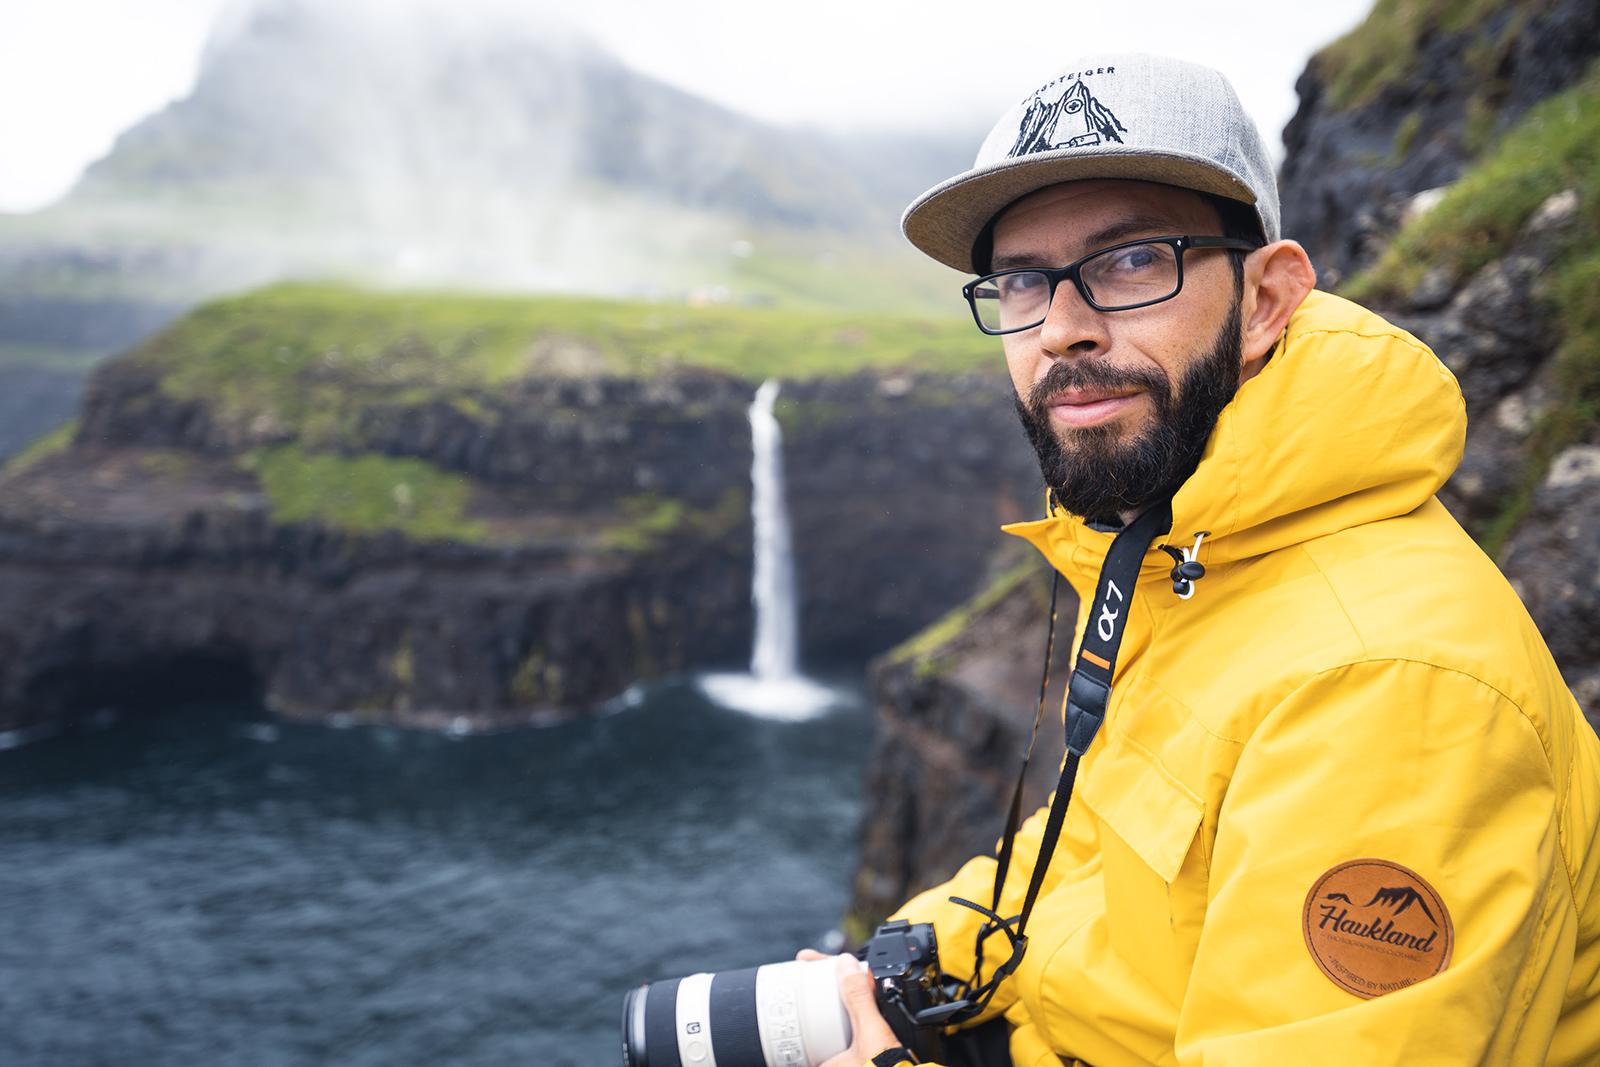 Outdoor Fotograf Fabian Künzel im Interview